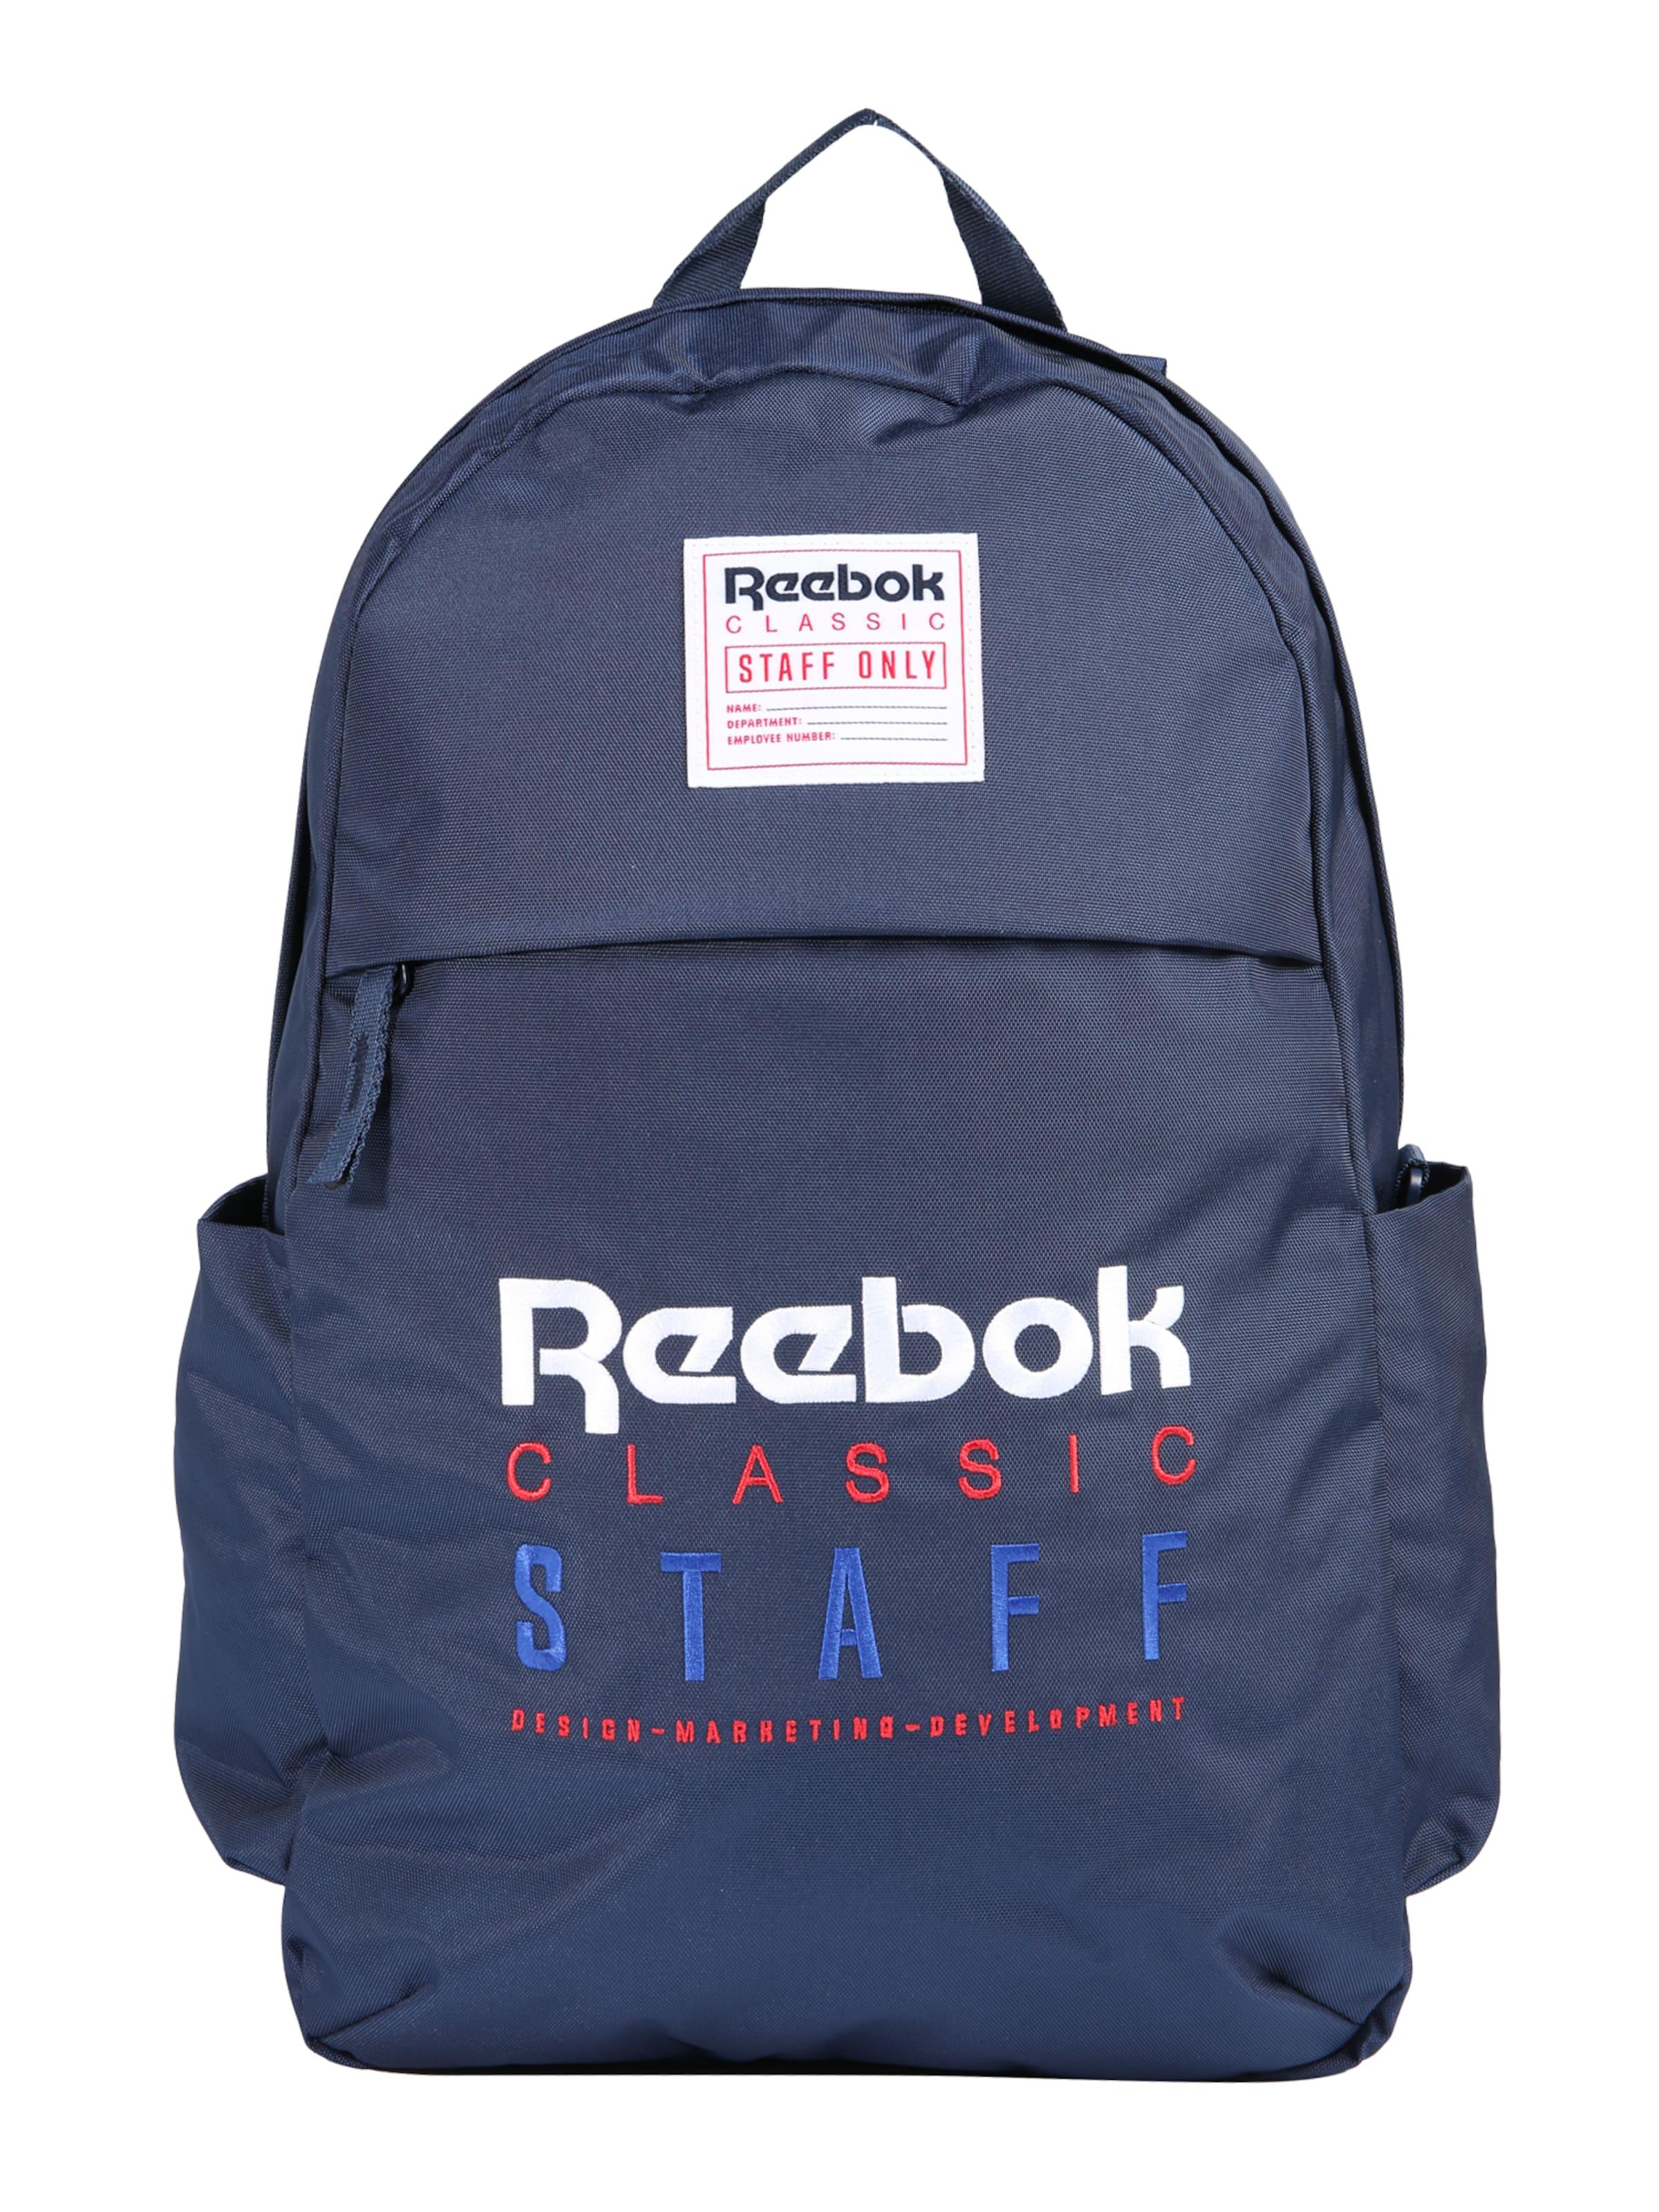 Tasche Classic Backpack' Jwf Reebok In Navy 'cl vywOmnN08